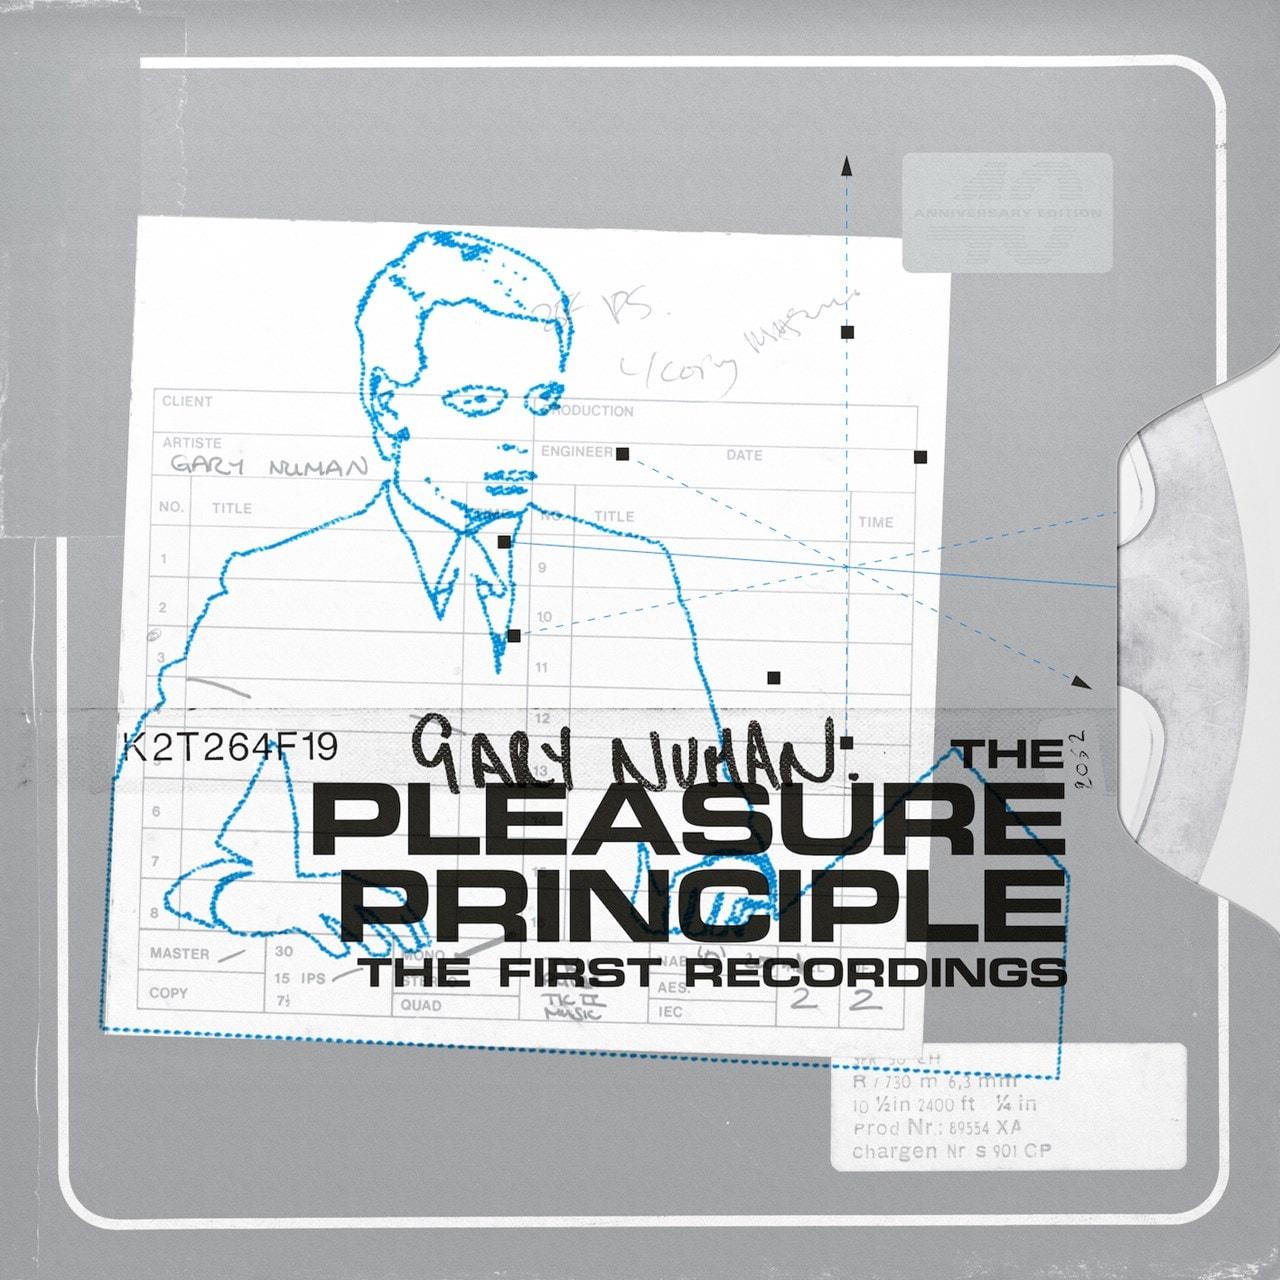 The Pleasure Principle: The First Recordings (Orange Vinyl) - 2